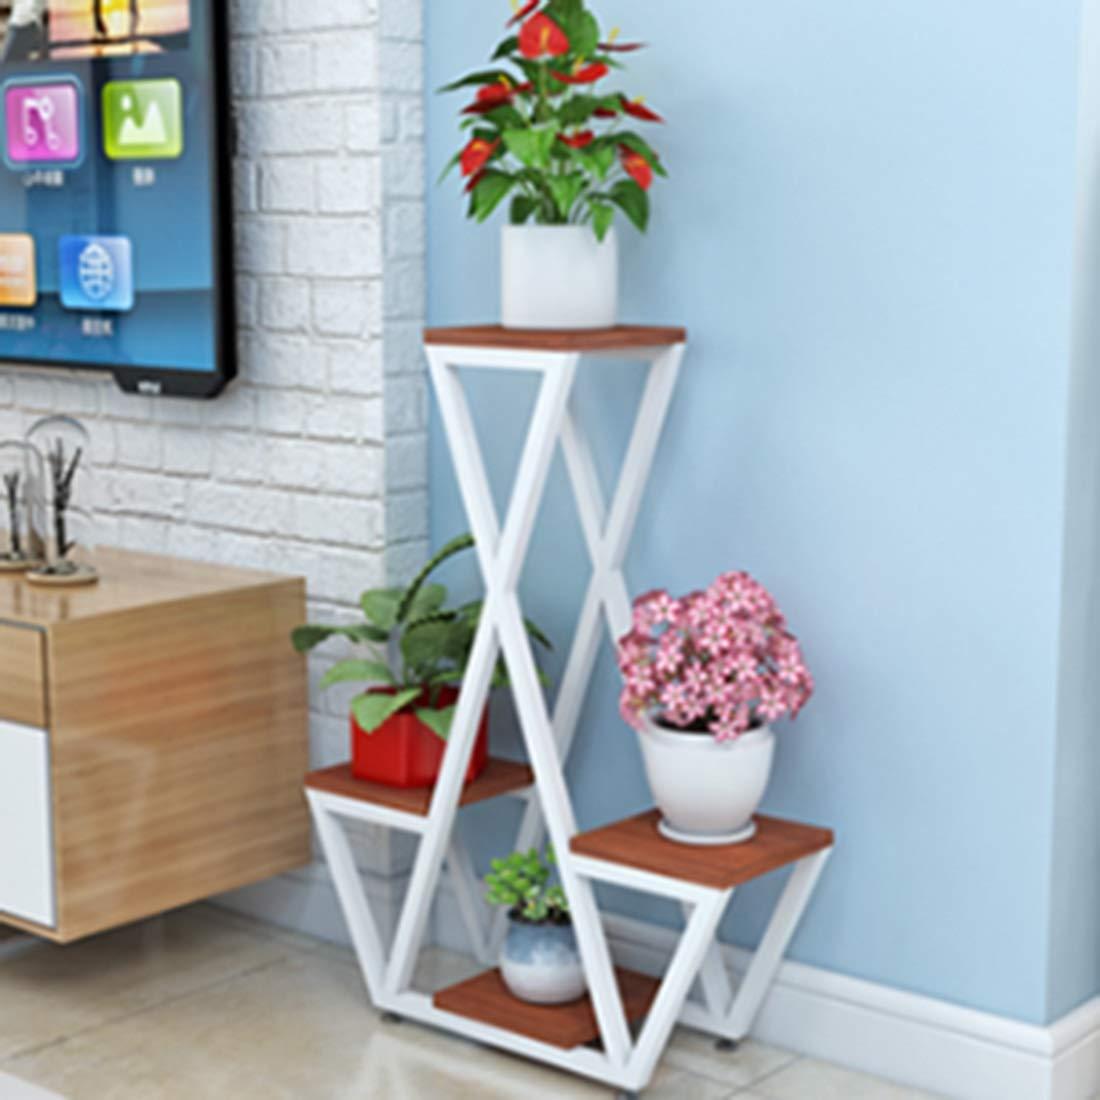 Mode nach Hause ZHILIAN® Einfaches Holz Pergolen Und Kreativer Nordic Familie Wohnzimmer Stock Balkon Blaume Multifunktionslagerregal (Farbe   B) B